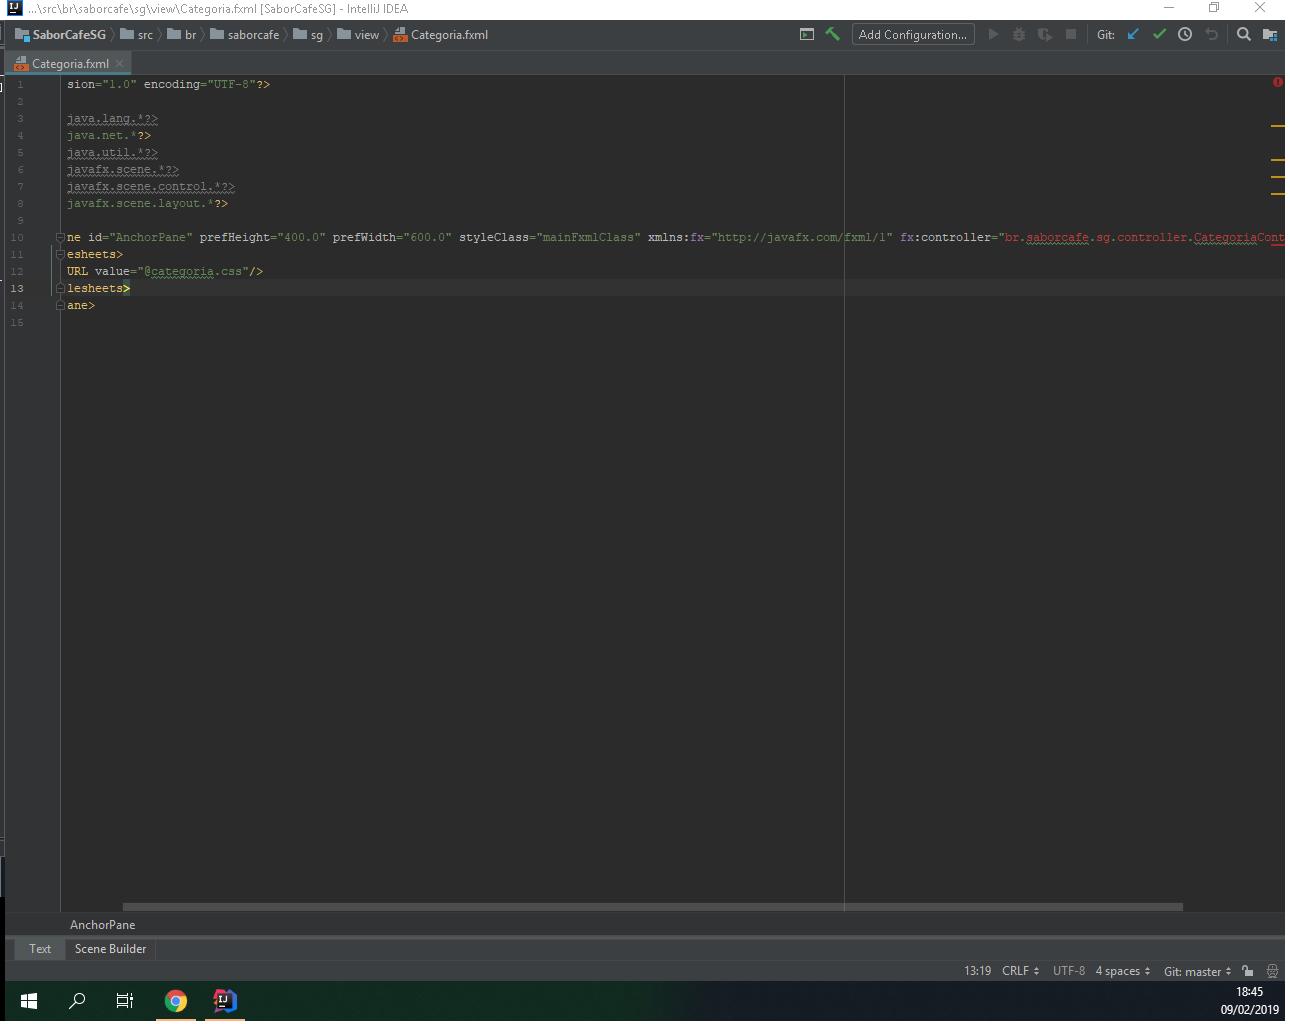 JavaFX Scene Builder erro no arquivo FXML - Java - GUJ